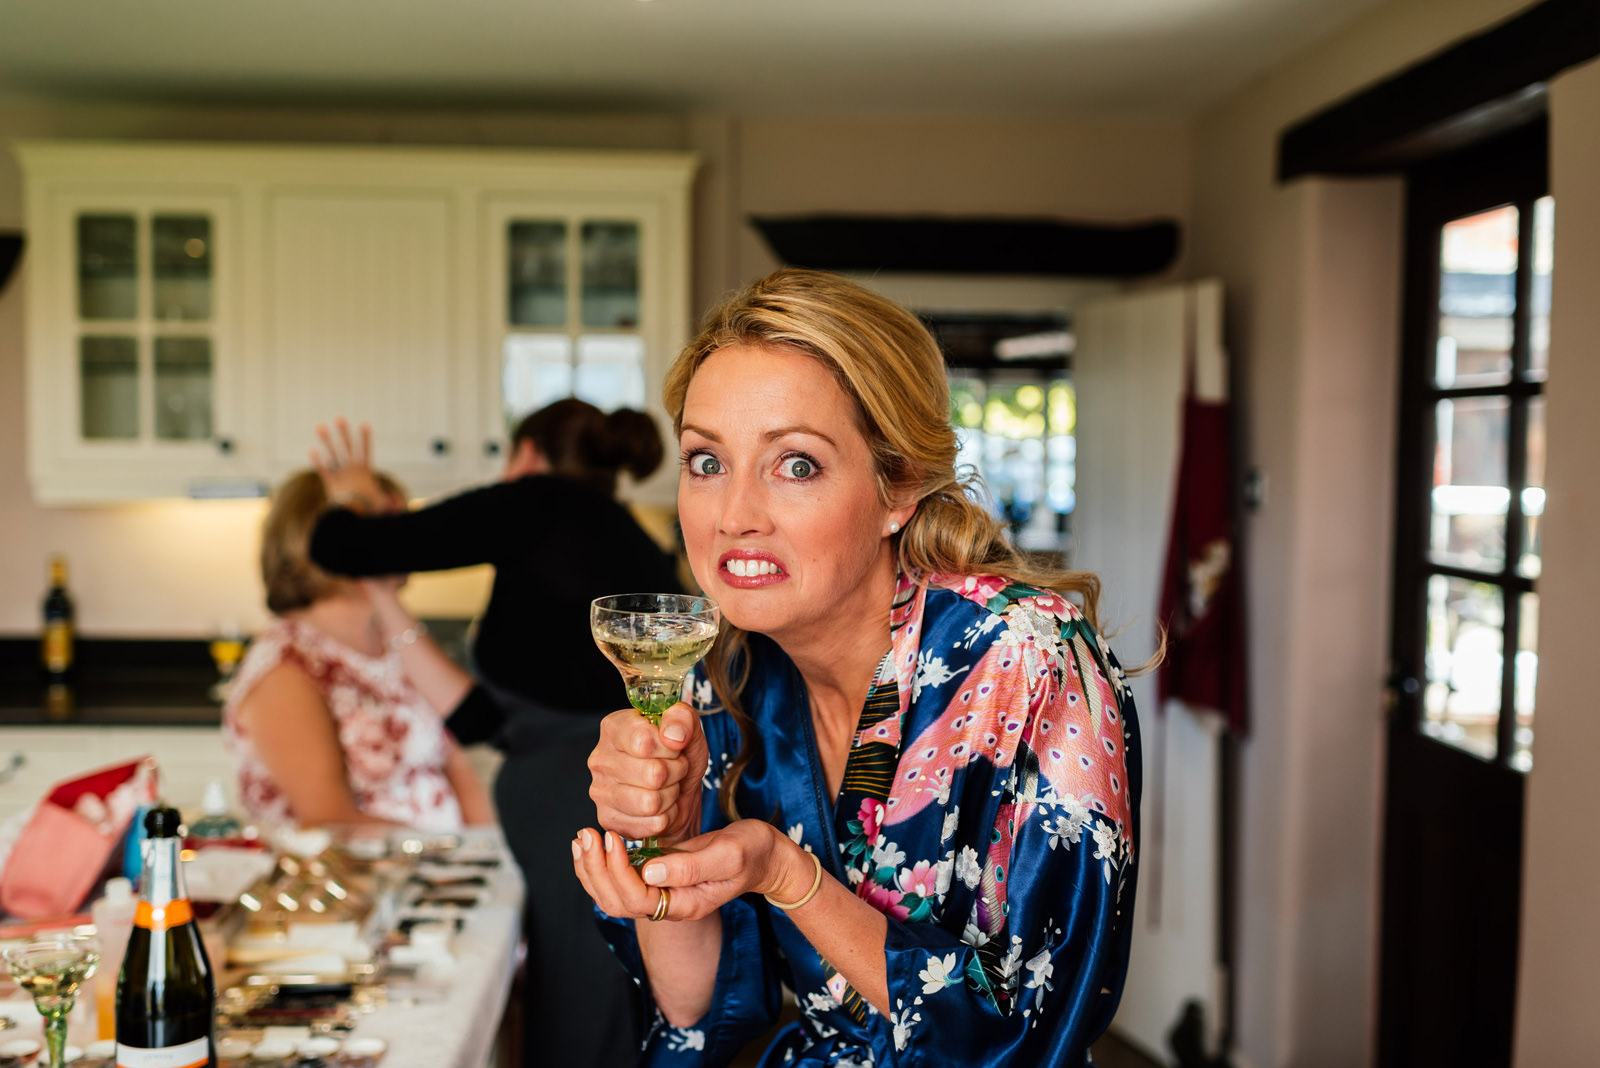 bridesmaid caught having a cheeky drink